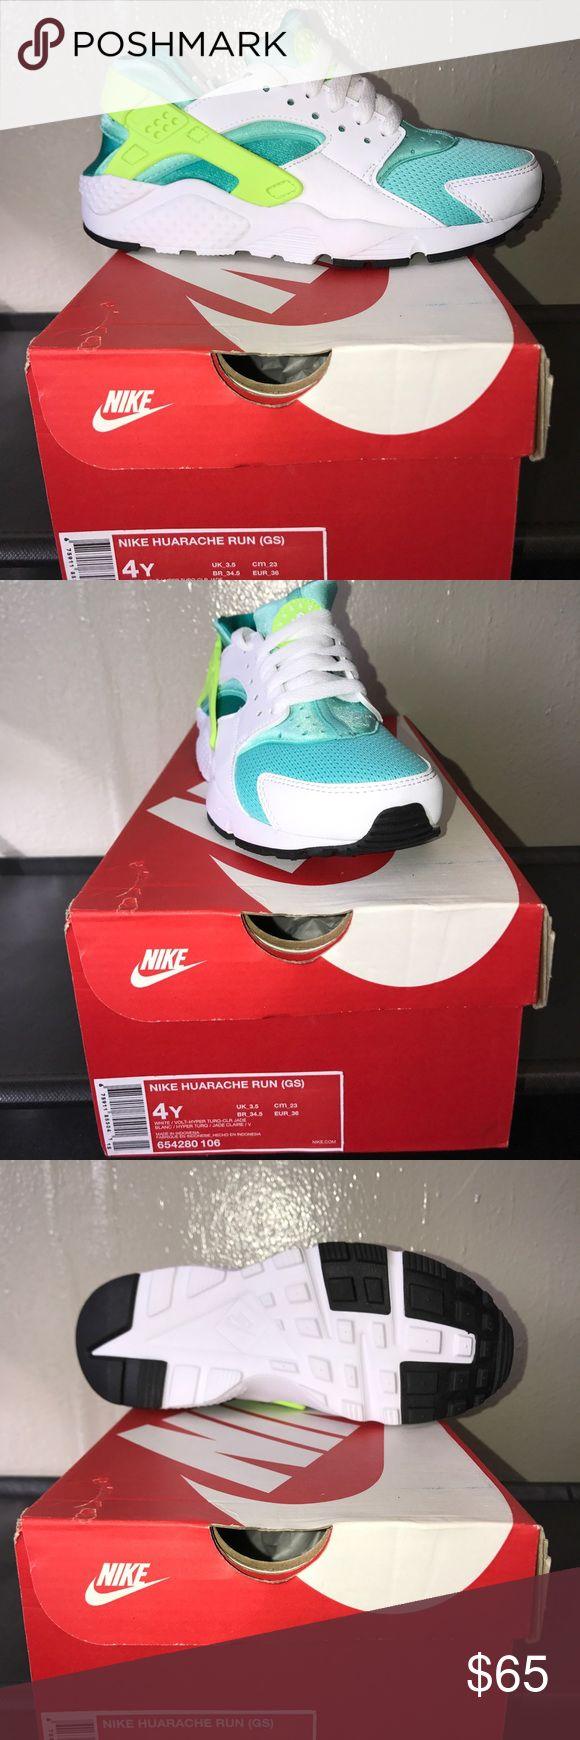 Kids Huarache Run: Grade School Size 4 Brand New in Box! Authentic Kids Huarache Run: Grade School Size 4 Nike Shoes Sneakers